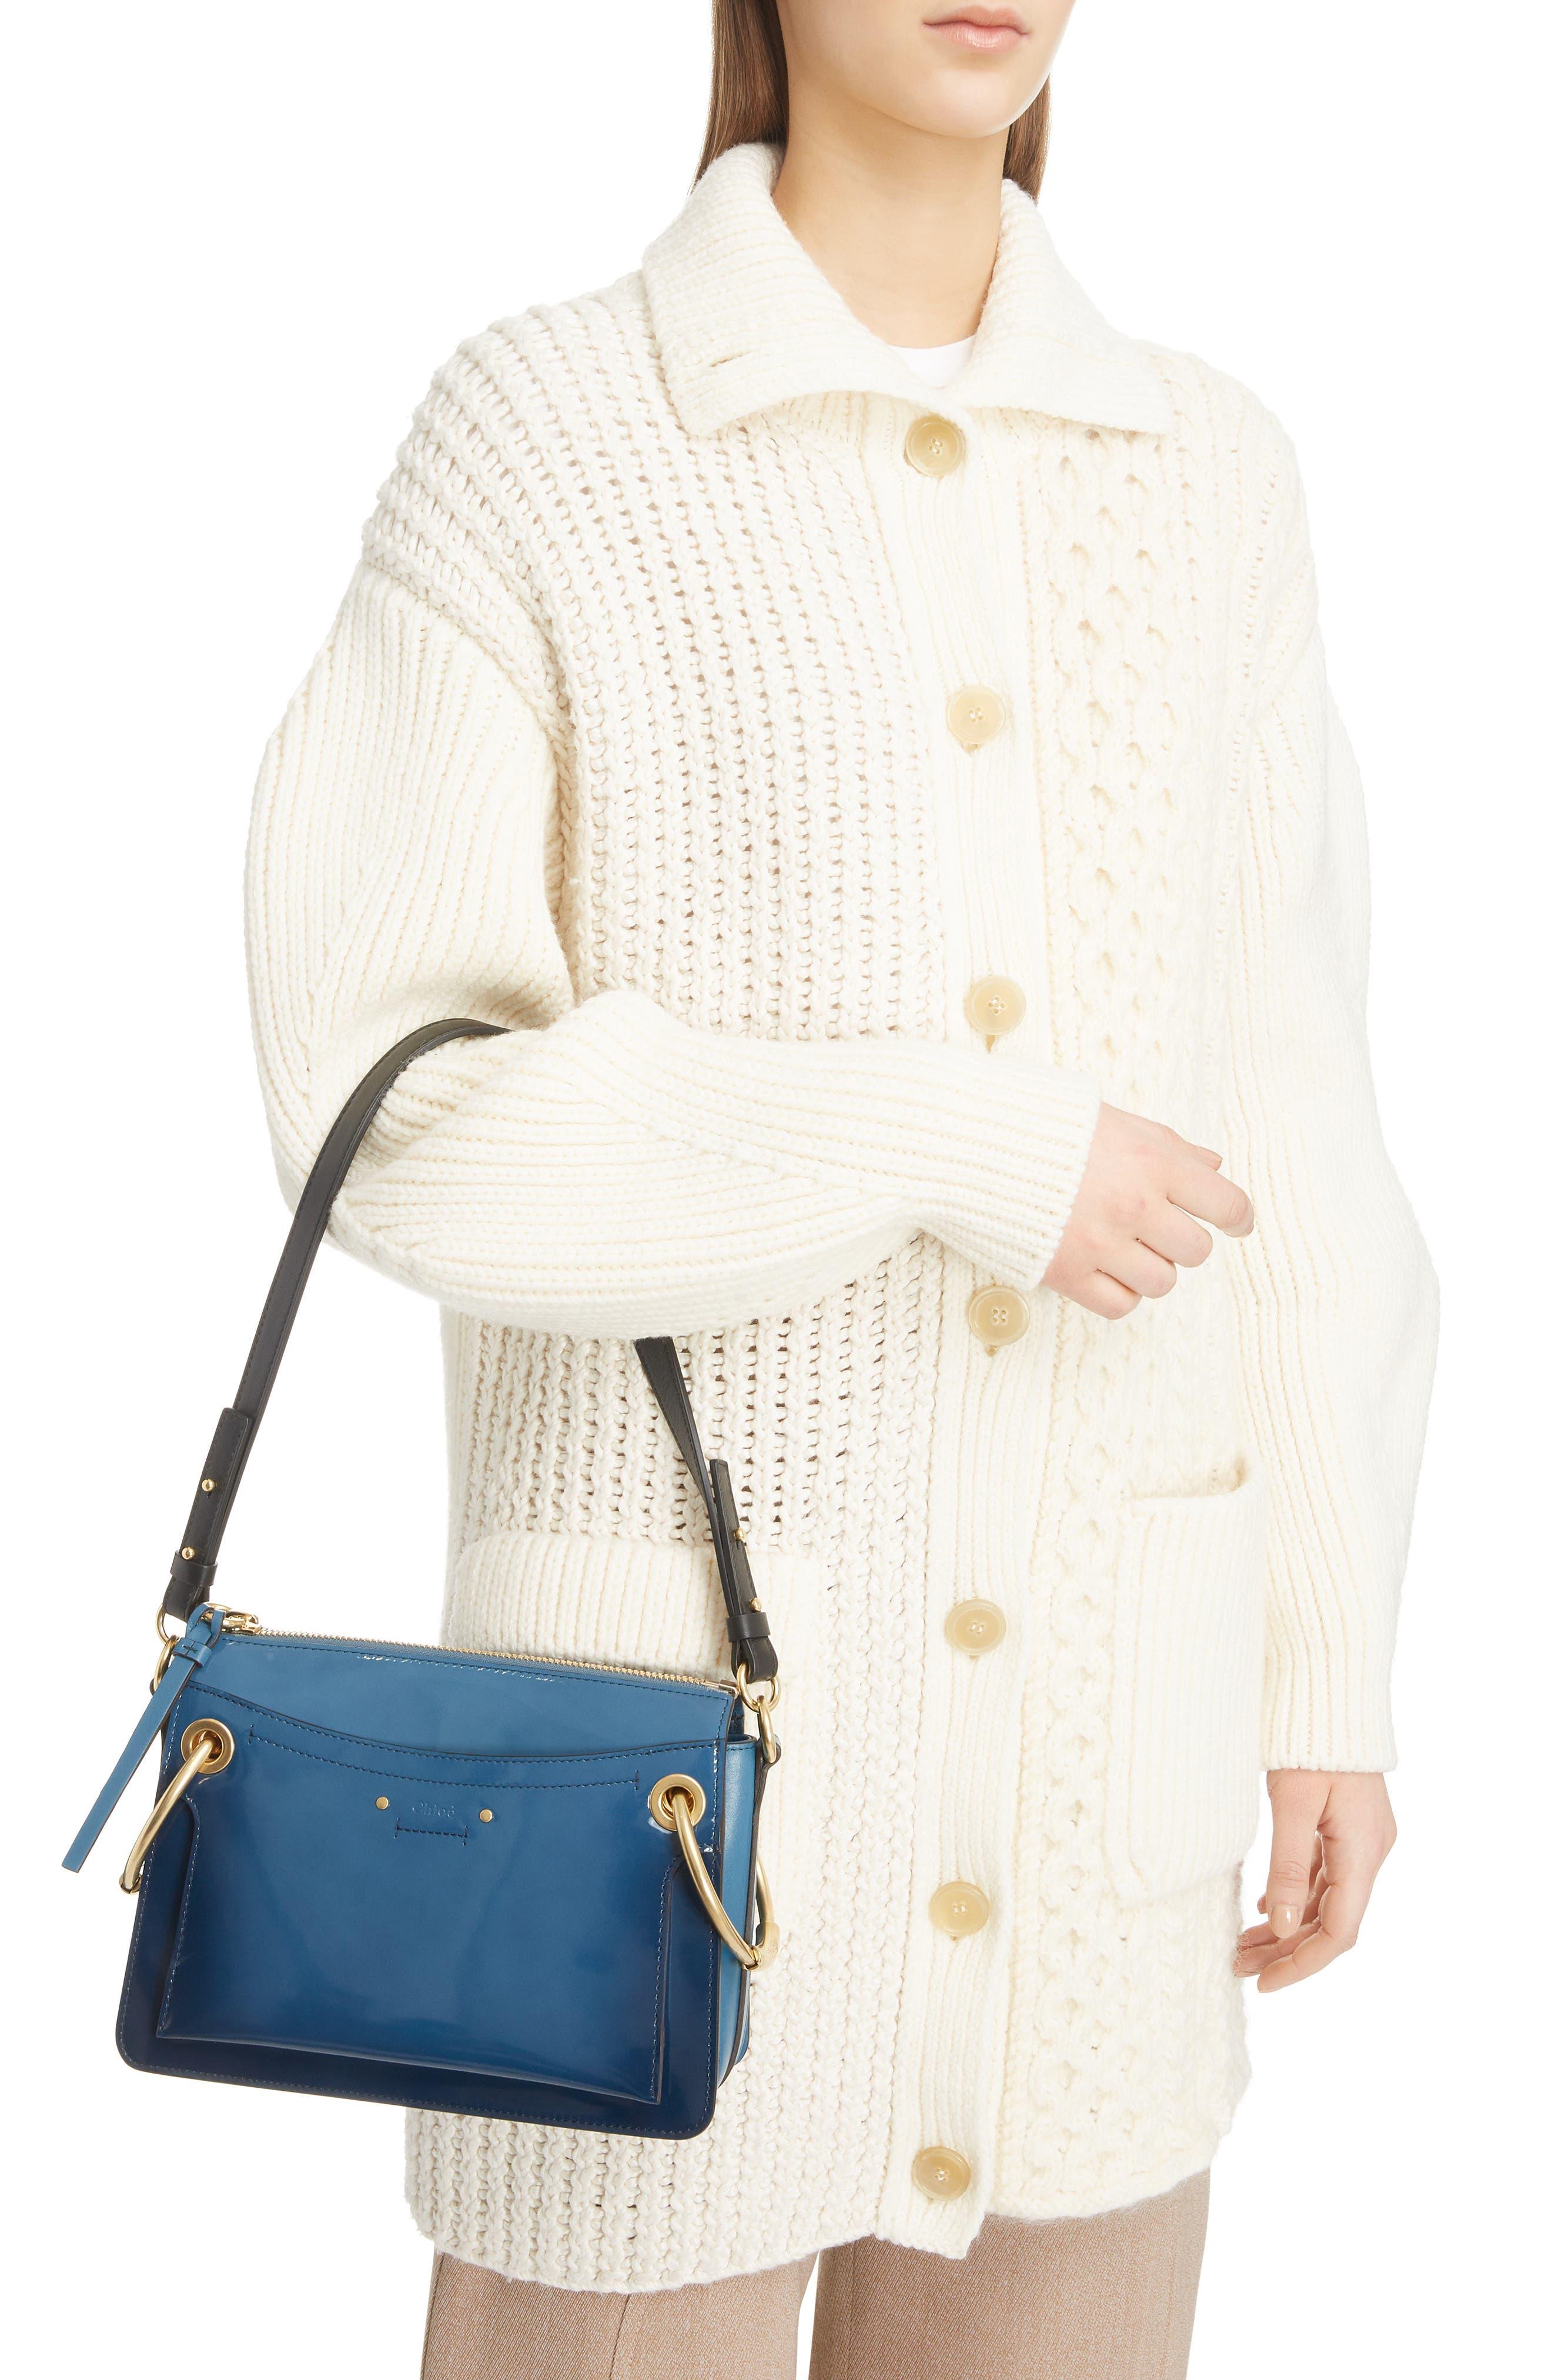 Small Roy Leather Shoulder Bag,                             Alternate thumbnail 2, color,                             VINYL BLUE